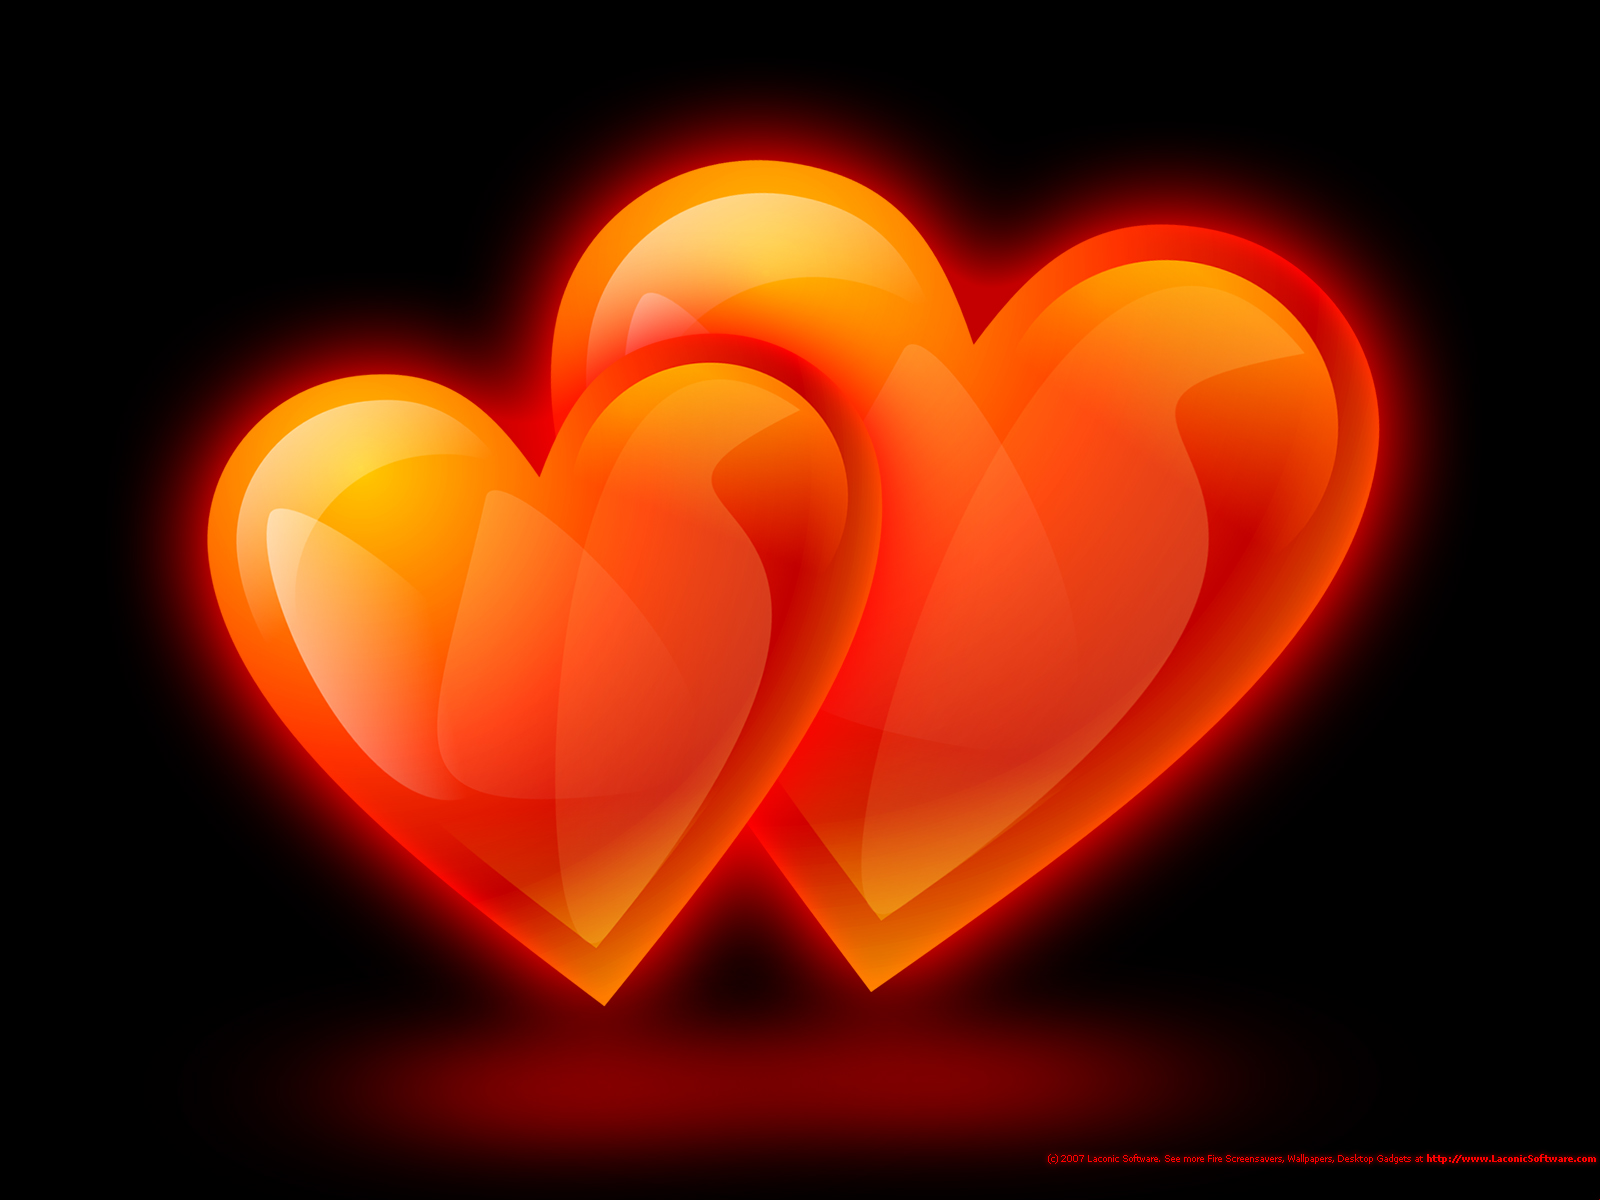 Cool HD Nature Desktop Wallpapers: Hearts Wallpapers